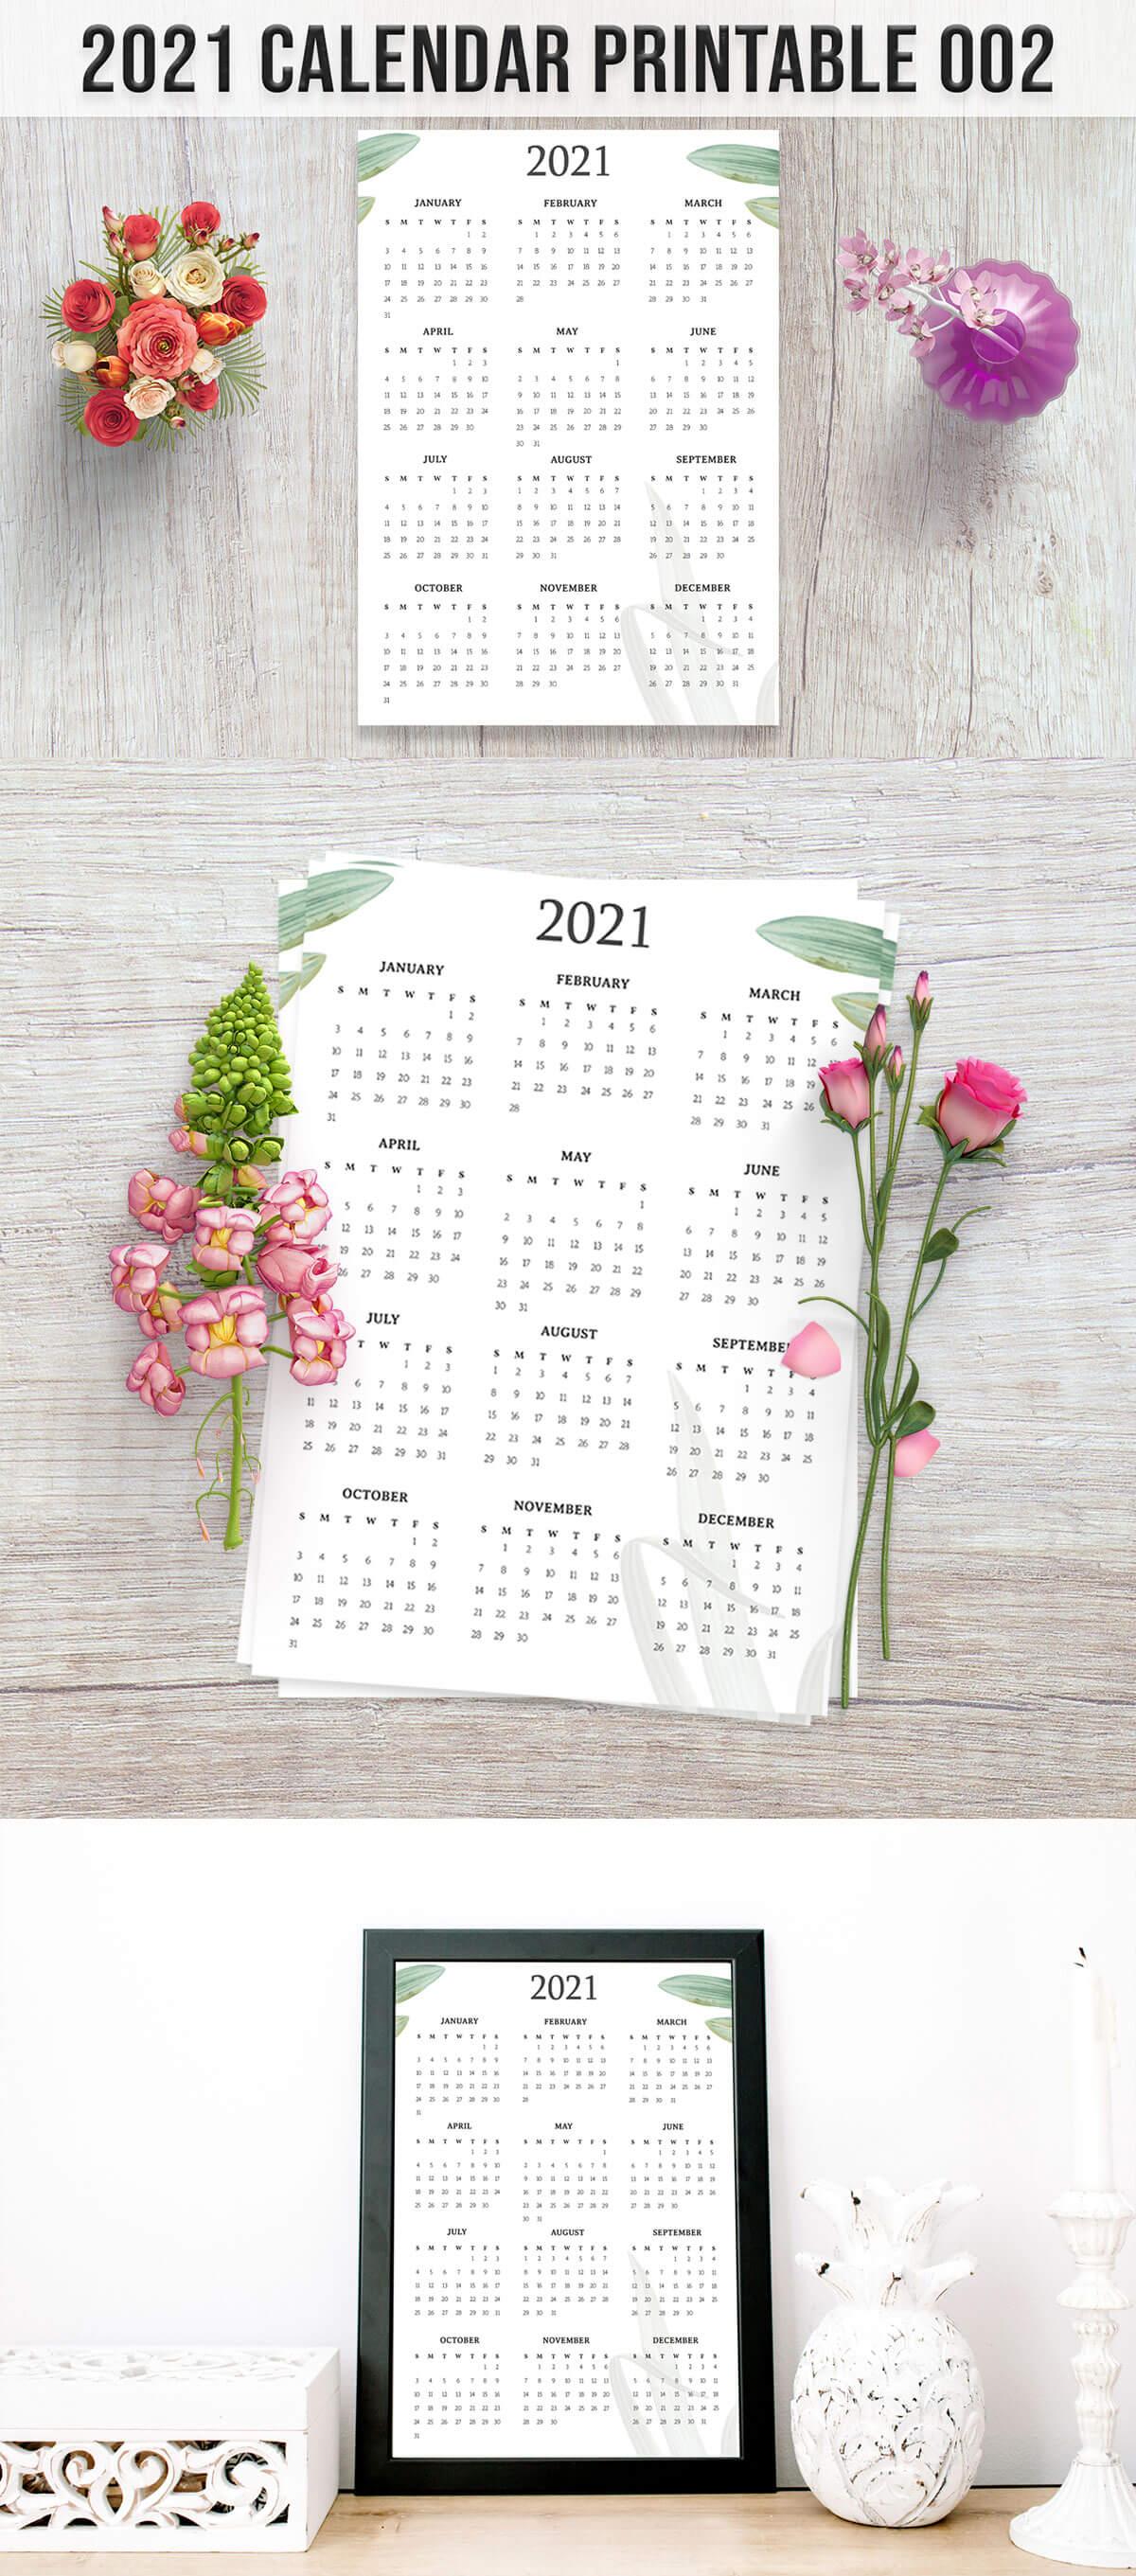 Free Calendar 2021 Printable 002